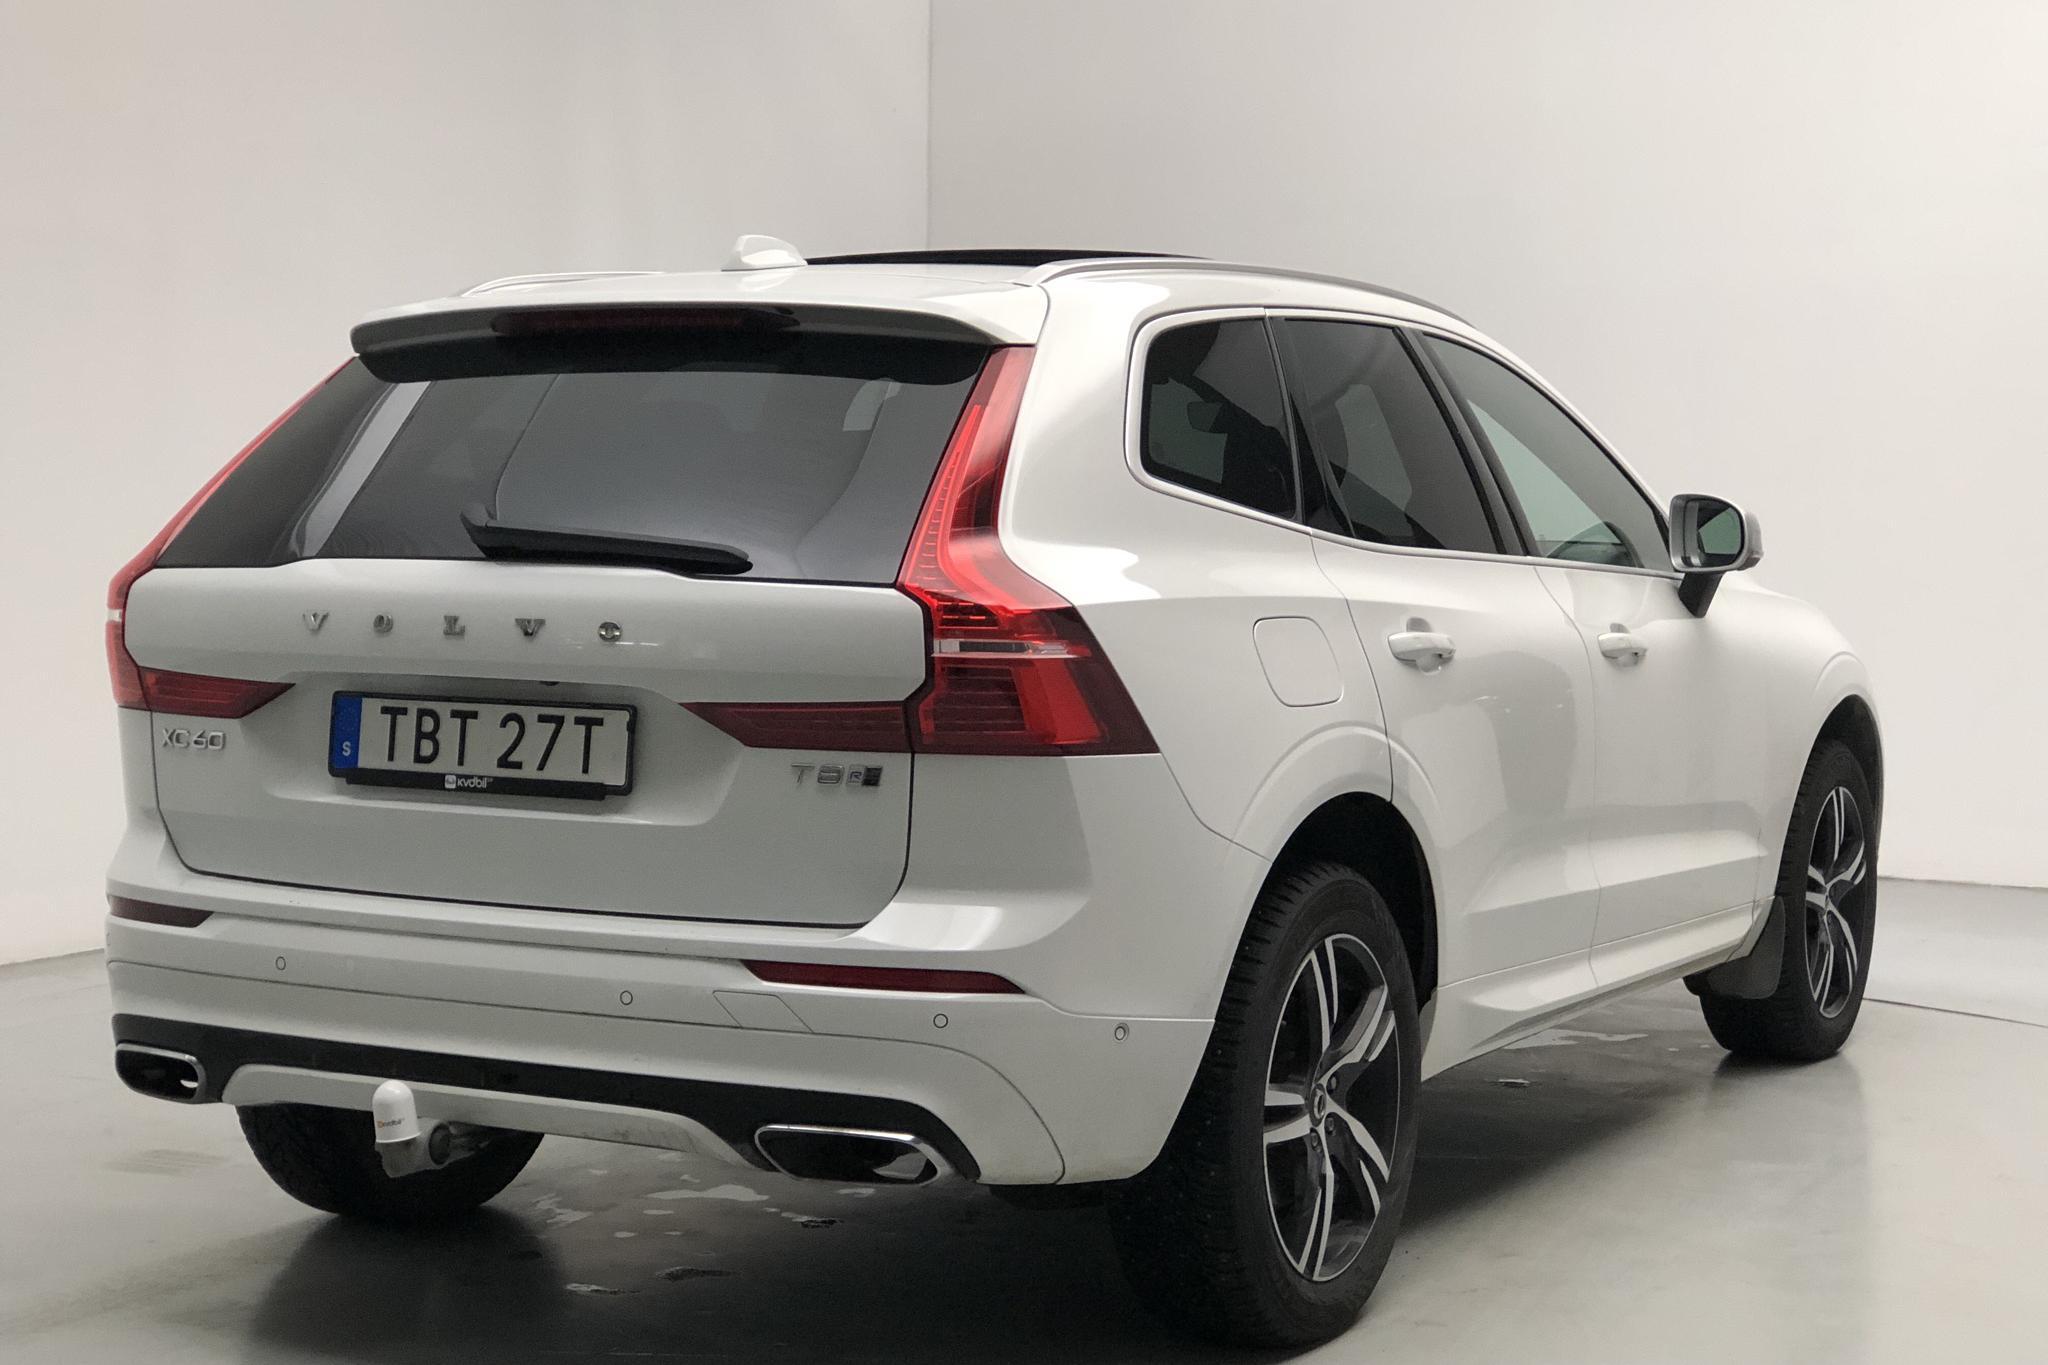 Volvo XC60 T8 AWD Twin Engine (390hk) - 102 120 km - Automatic - white - 2019